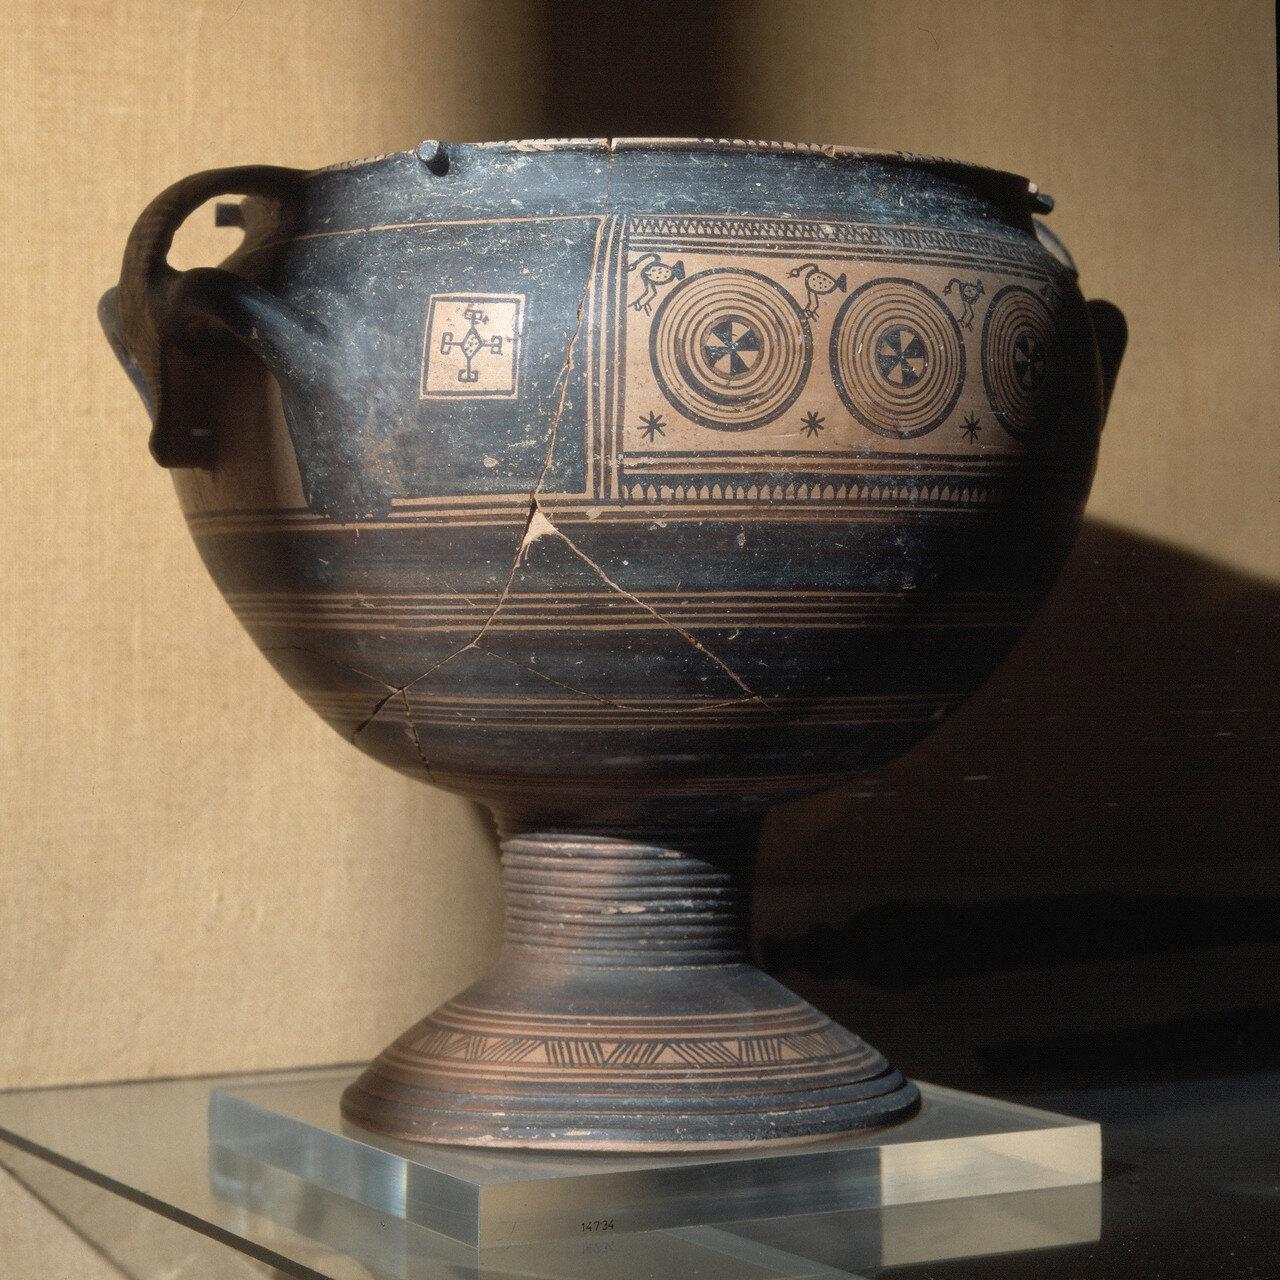 Родос, Археологический музей. Кратер. Вторая половина VIII в. до н.э.